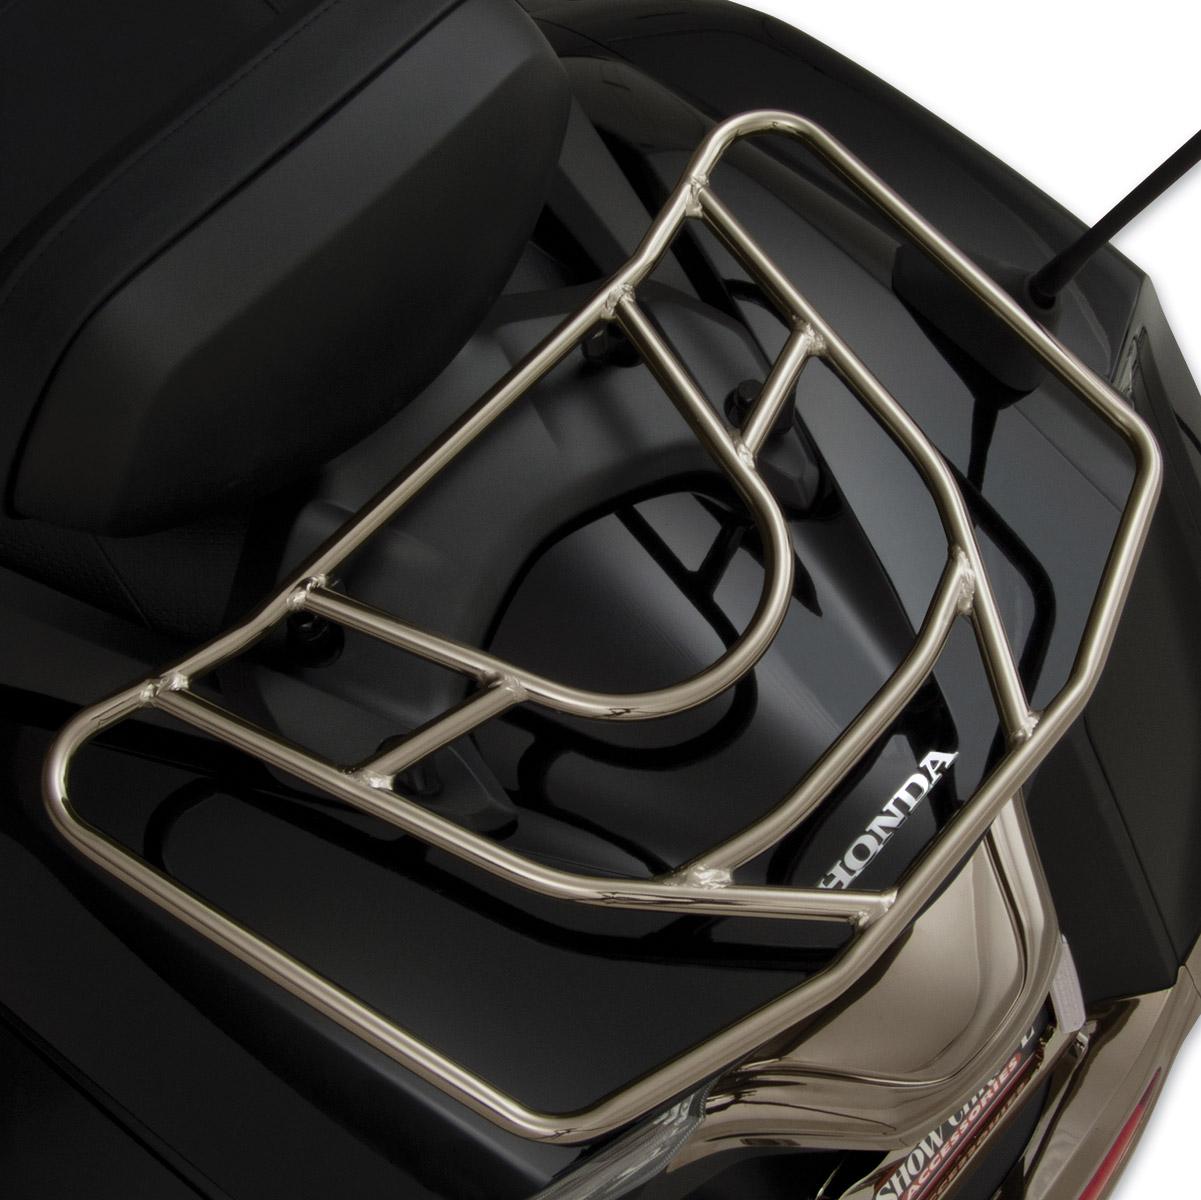 Show Chrome Accessories Smoked Tour Luggage Rack